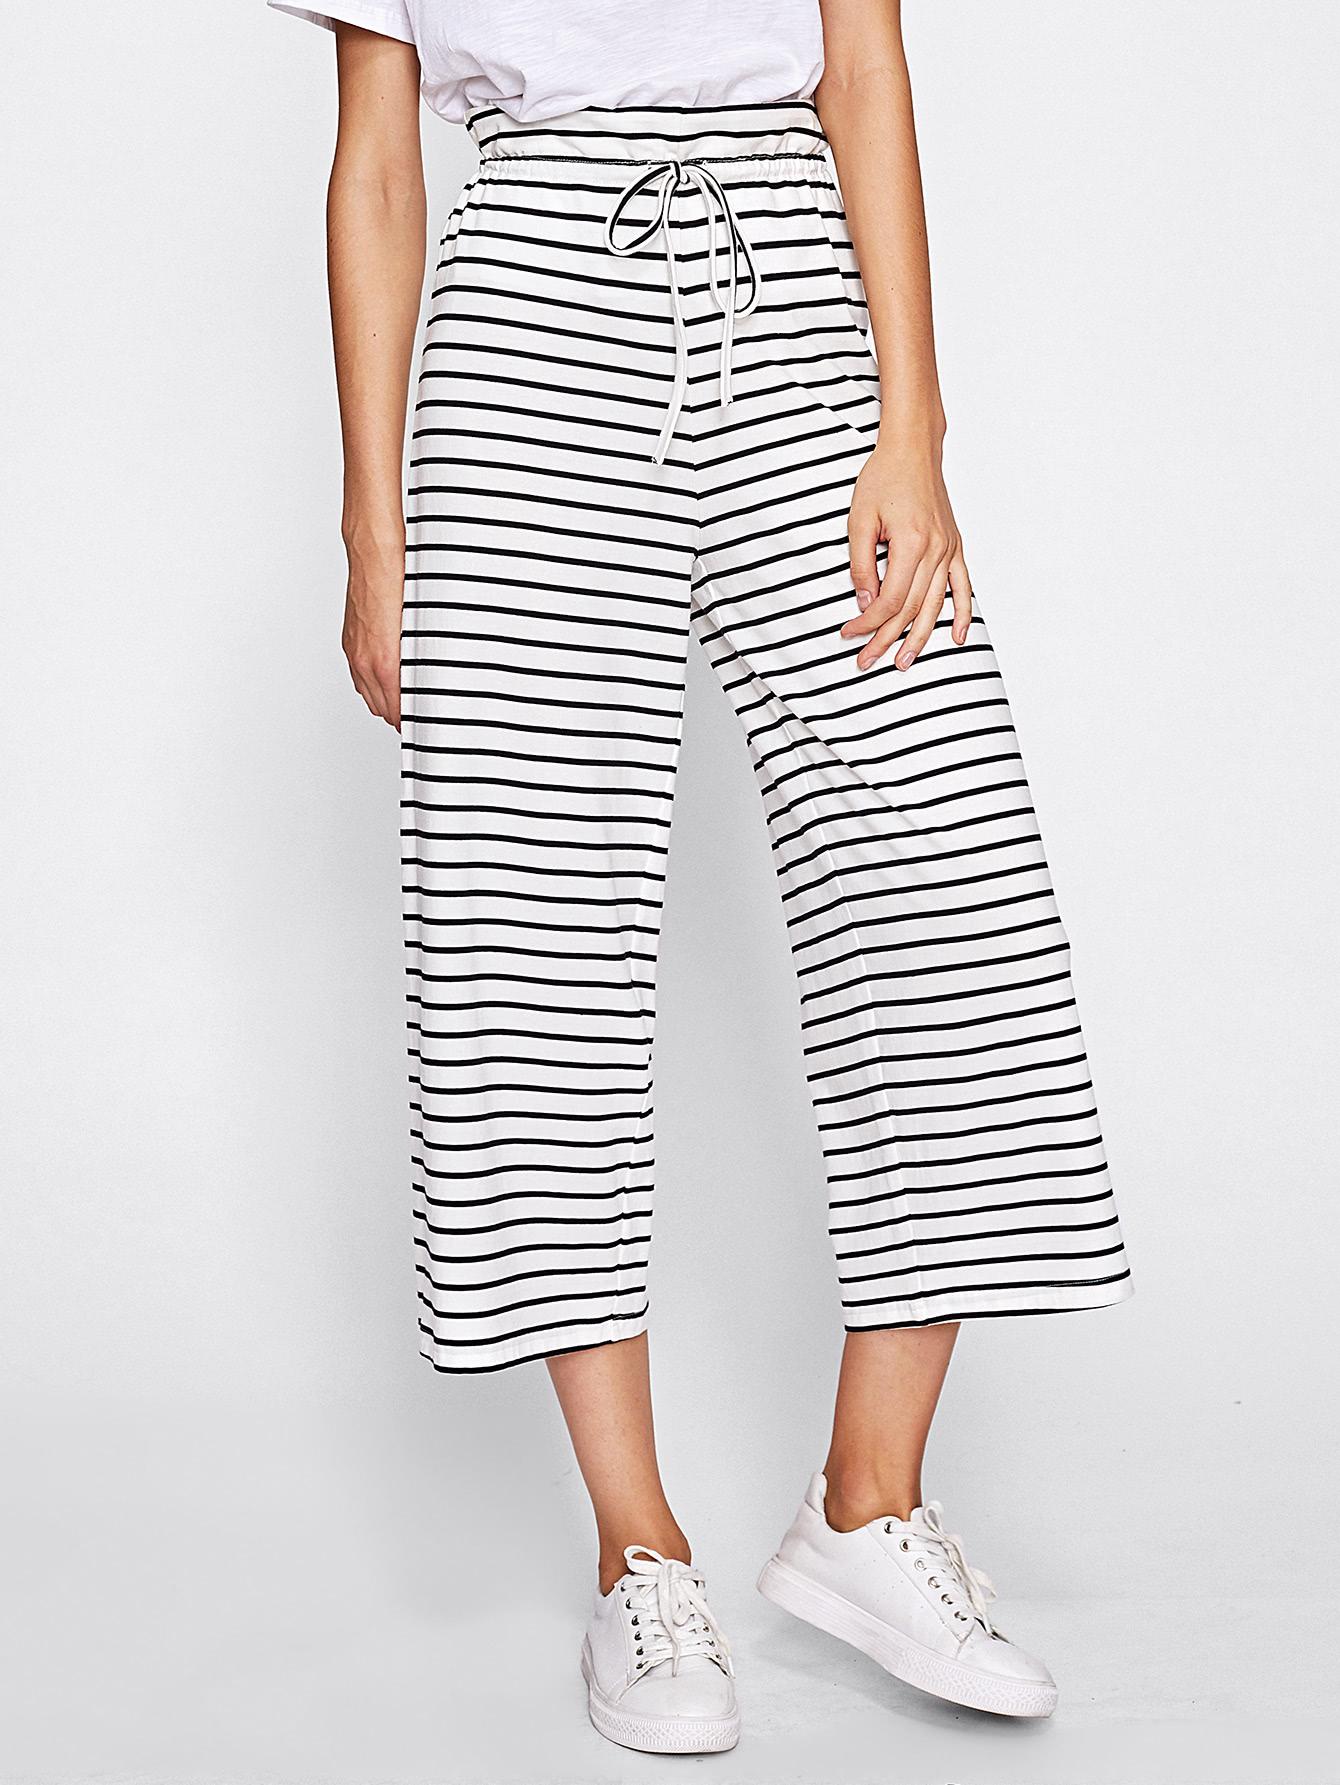 Striped Jersey Culotte Pants pants170807702